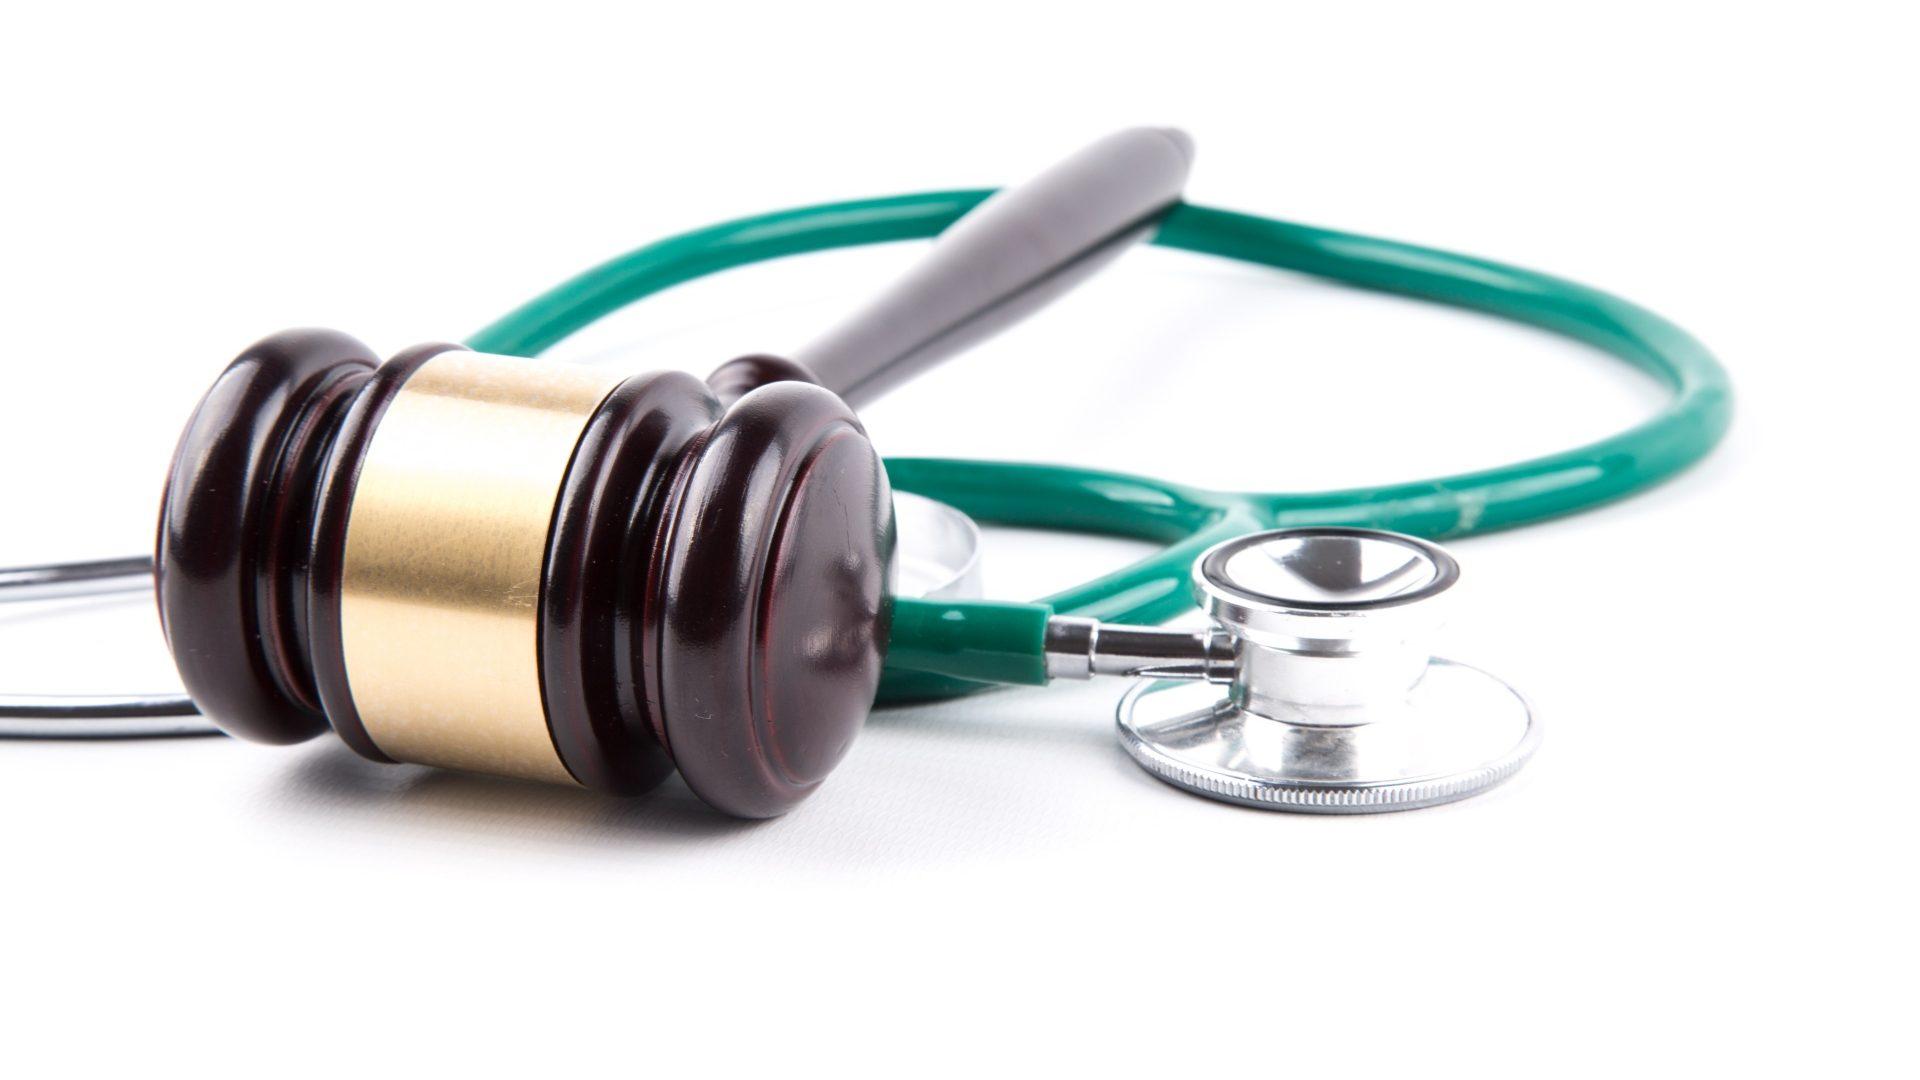 Photo of stethoscope and gavel